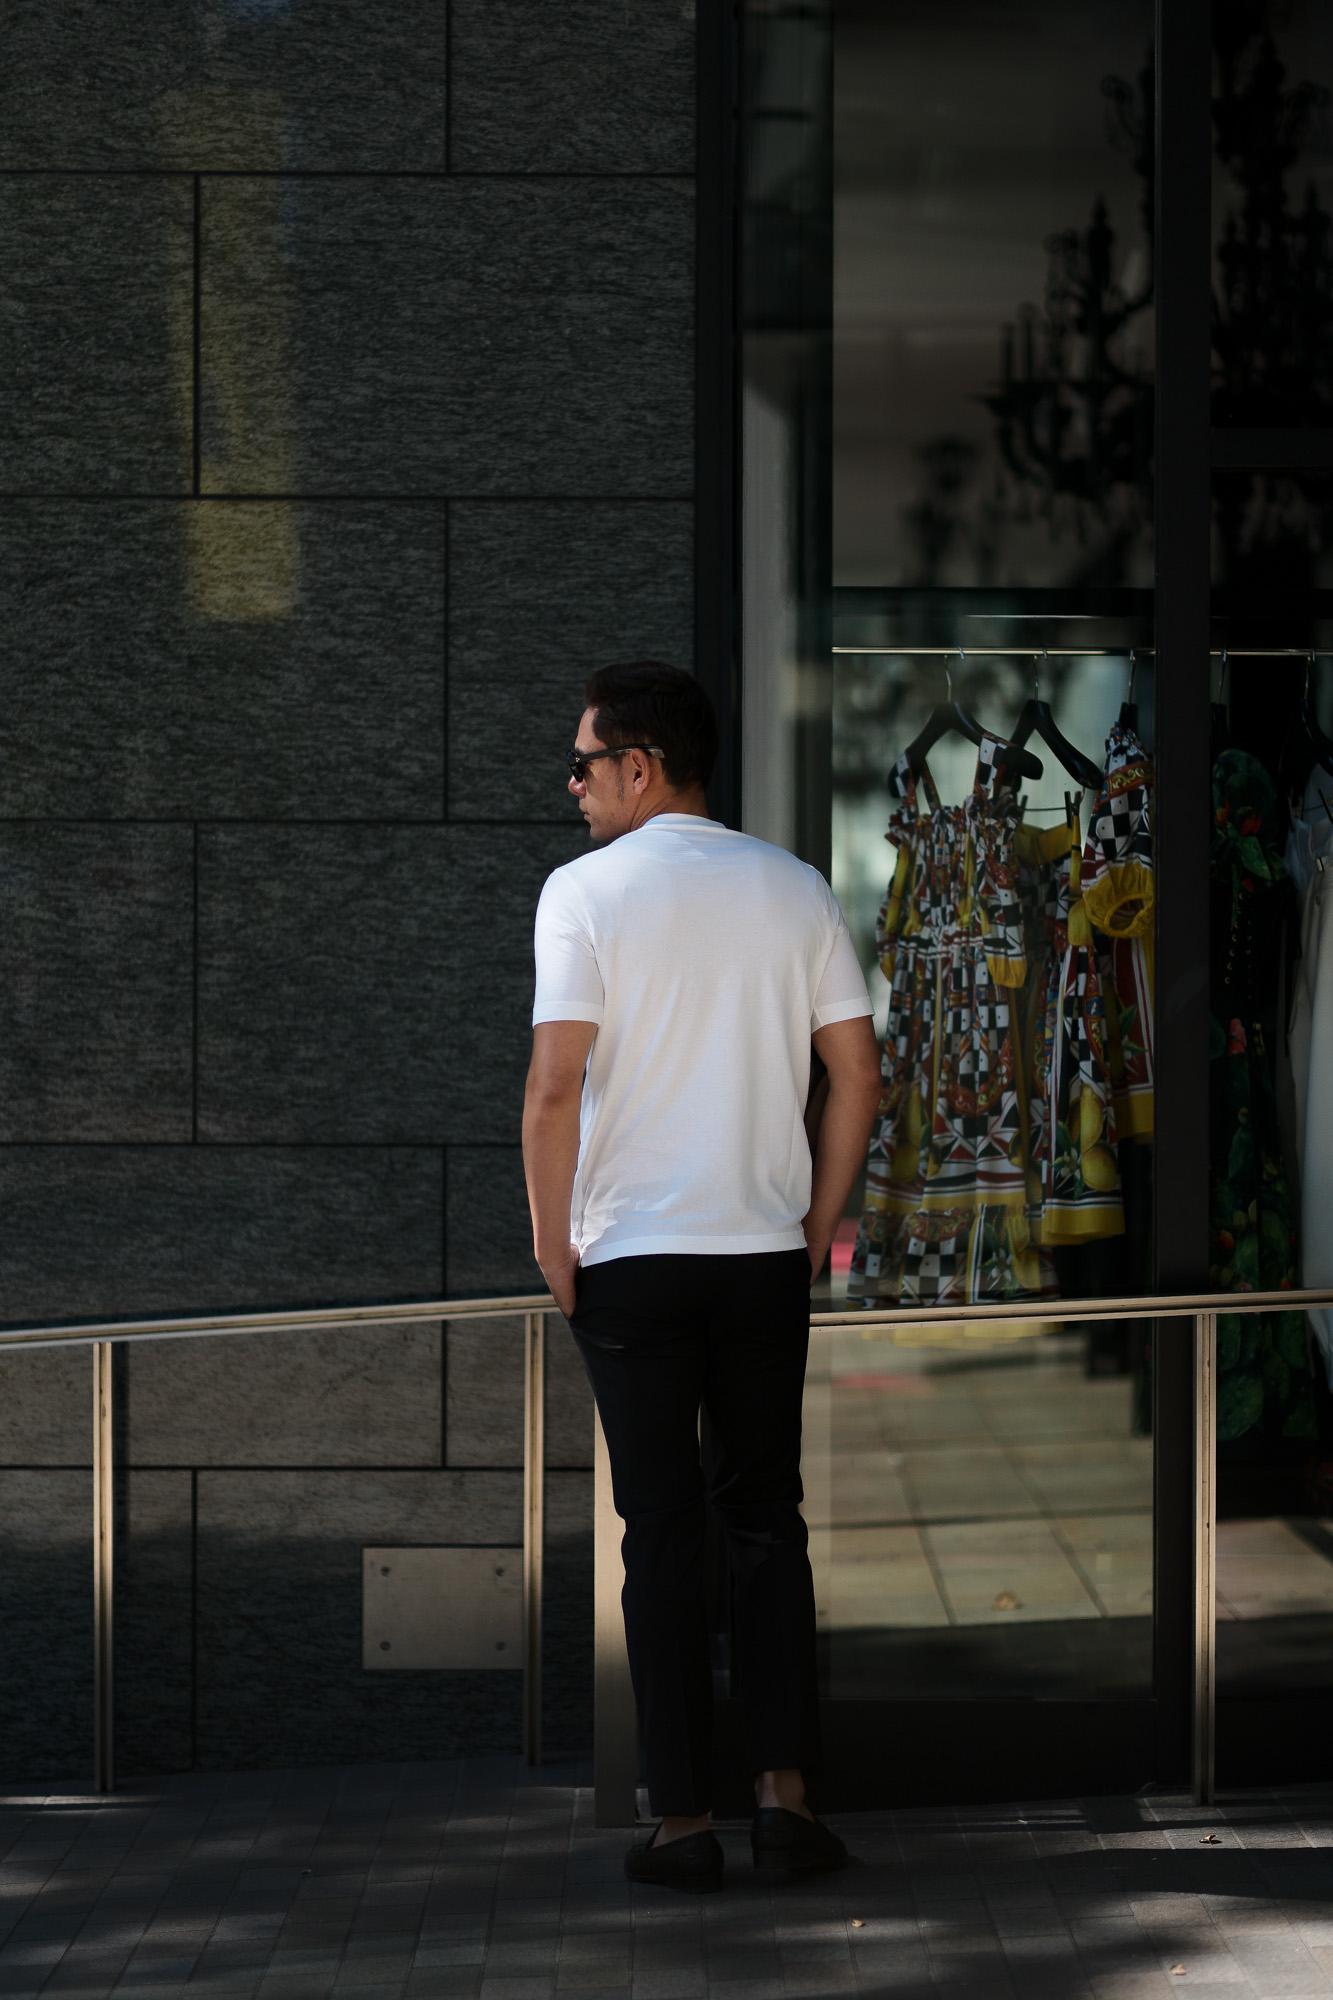 ZANONE (ザノーネ) Crew Neck T-shirt (クルーネックTシャツ) ice cotton アイスコットン Tシャツ WHITE (ホワイト・Z0001) MADE IN ITALY(イタリア製) 2019 春夏新作 愛知 名古屋 altoediritto アルトエデリット